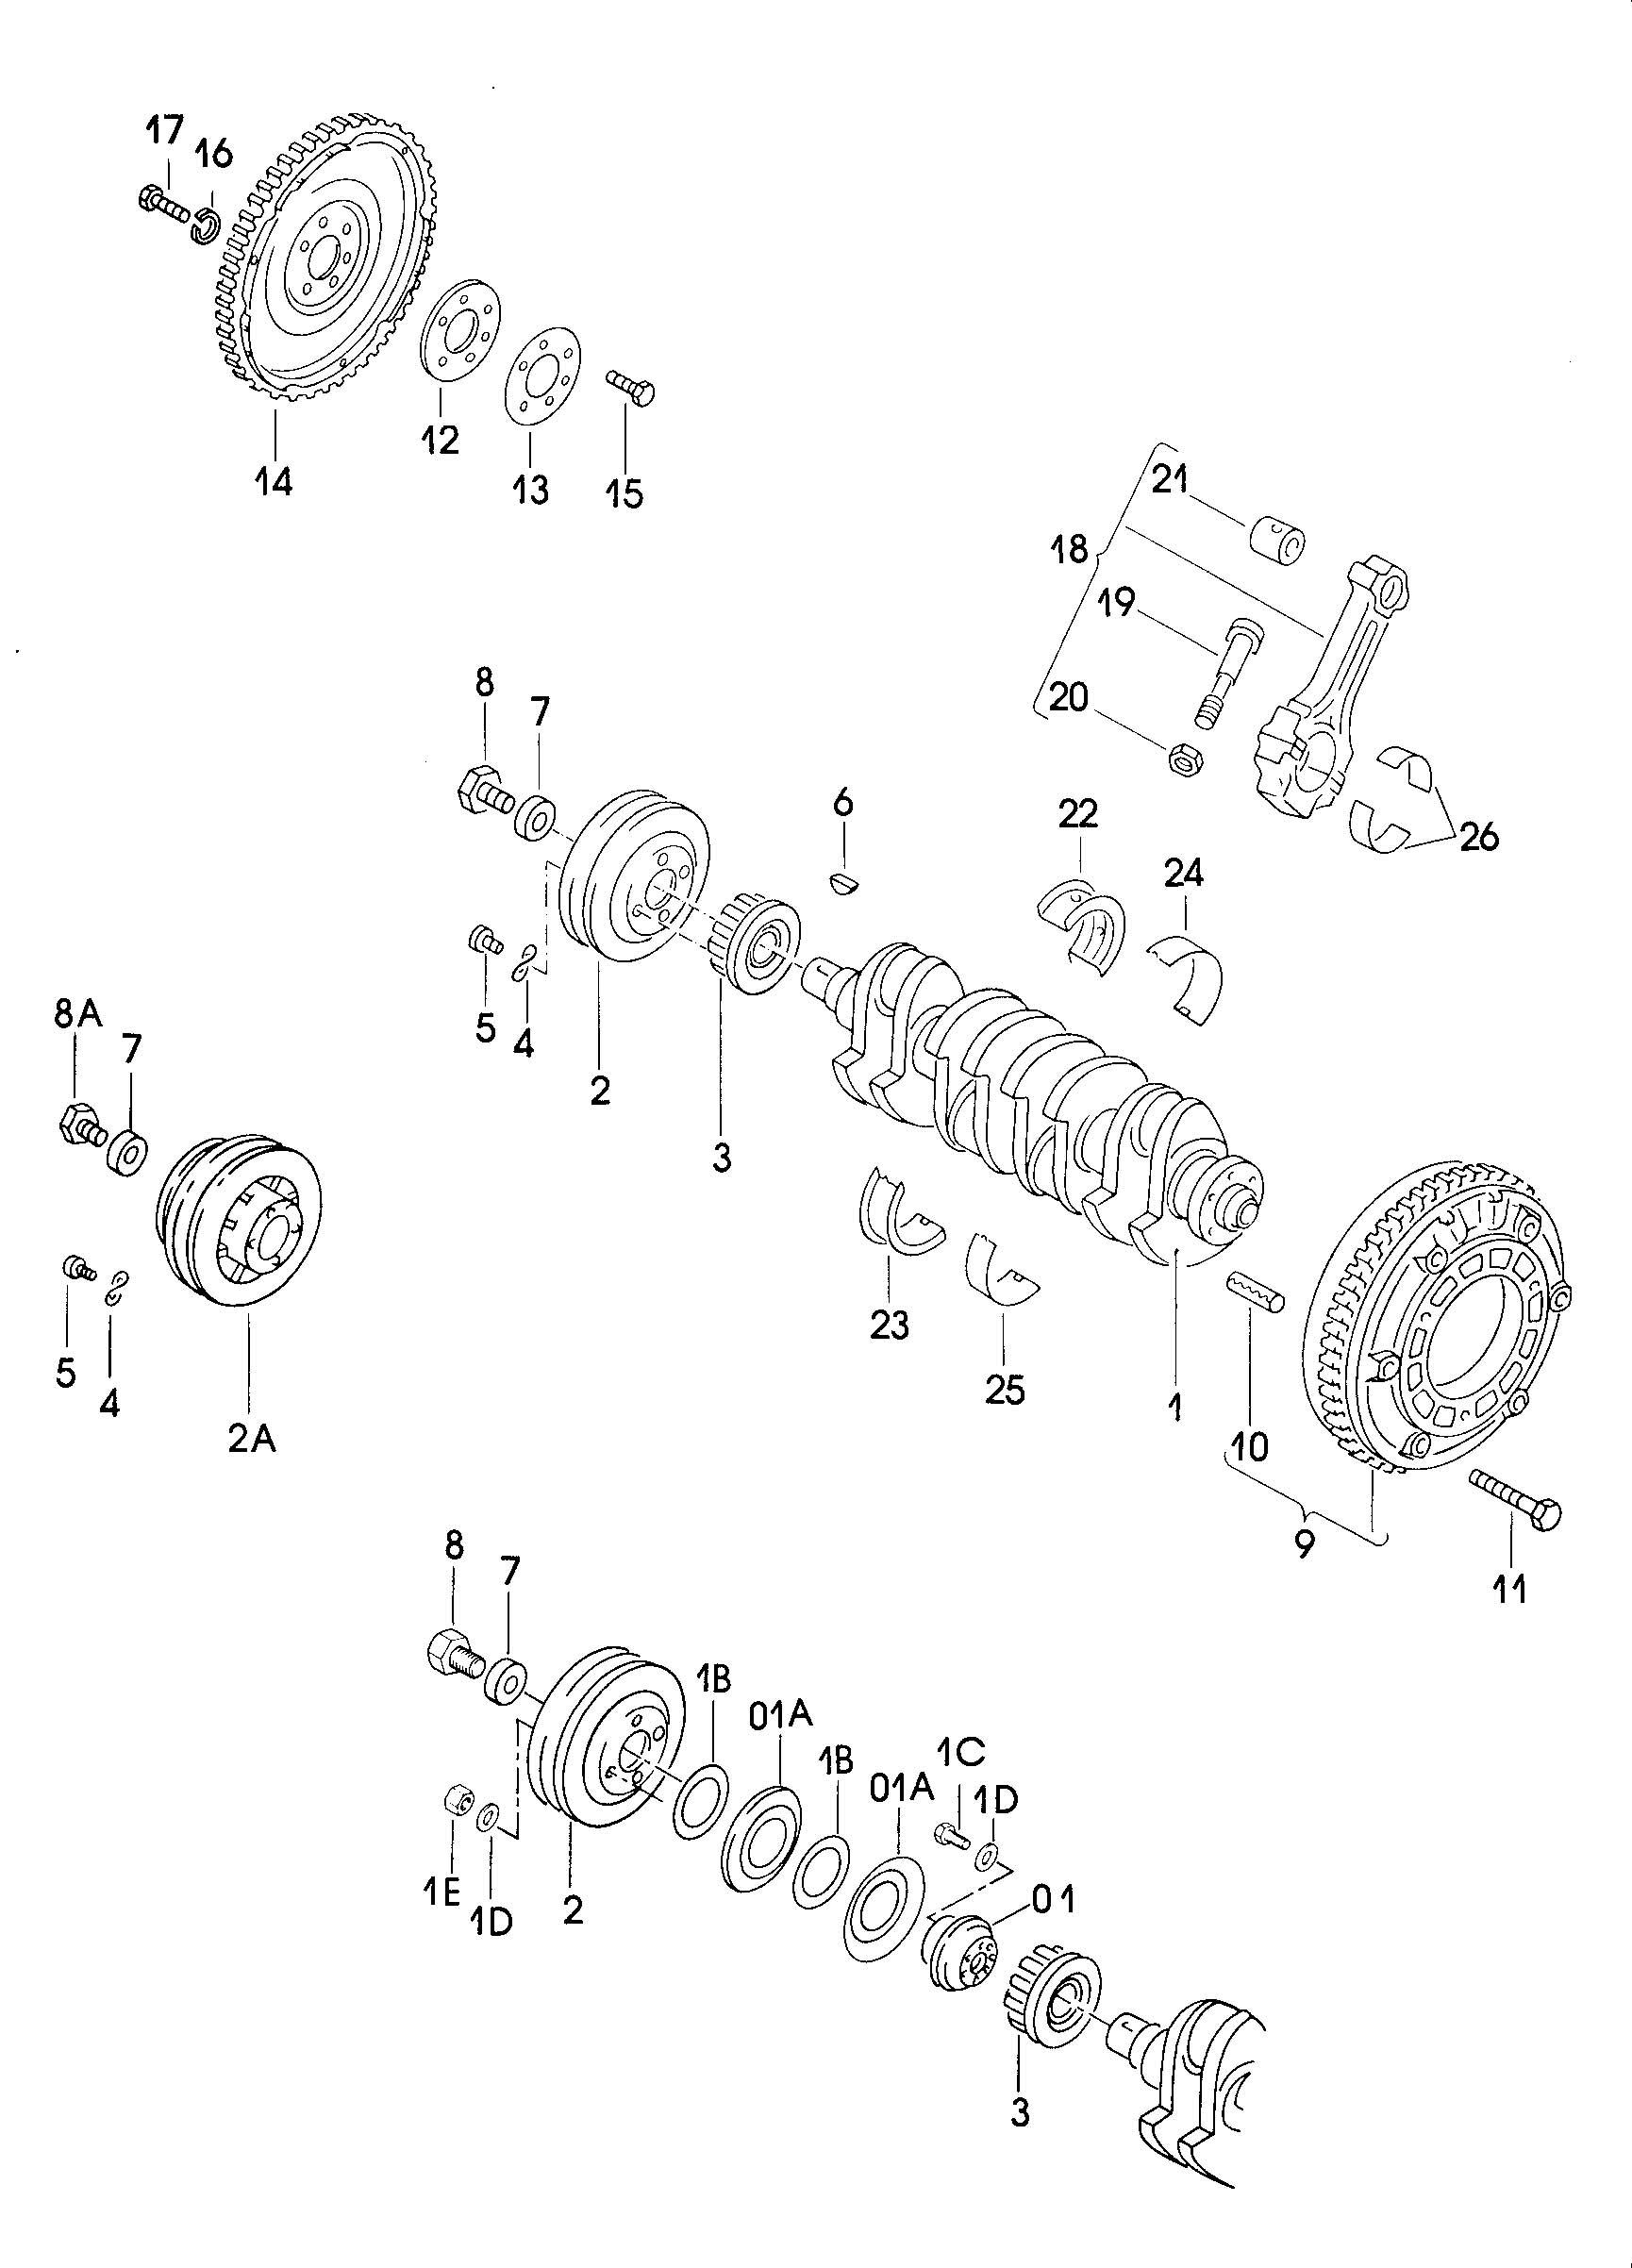 1981 Volkswagen Rabbit Mounting parts for refrigerant